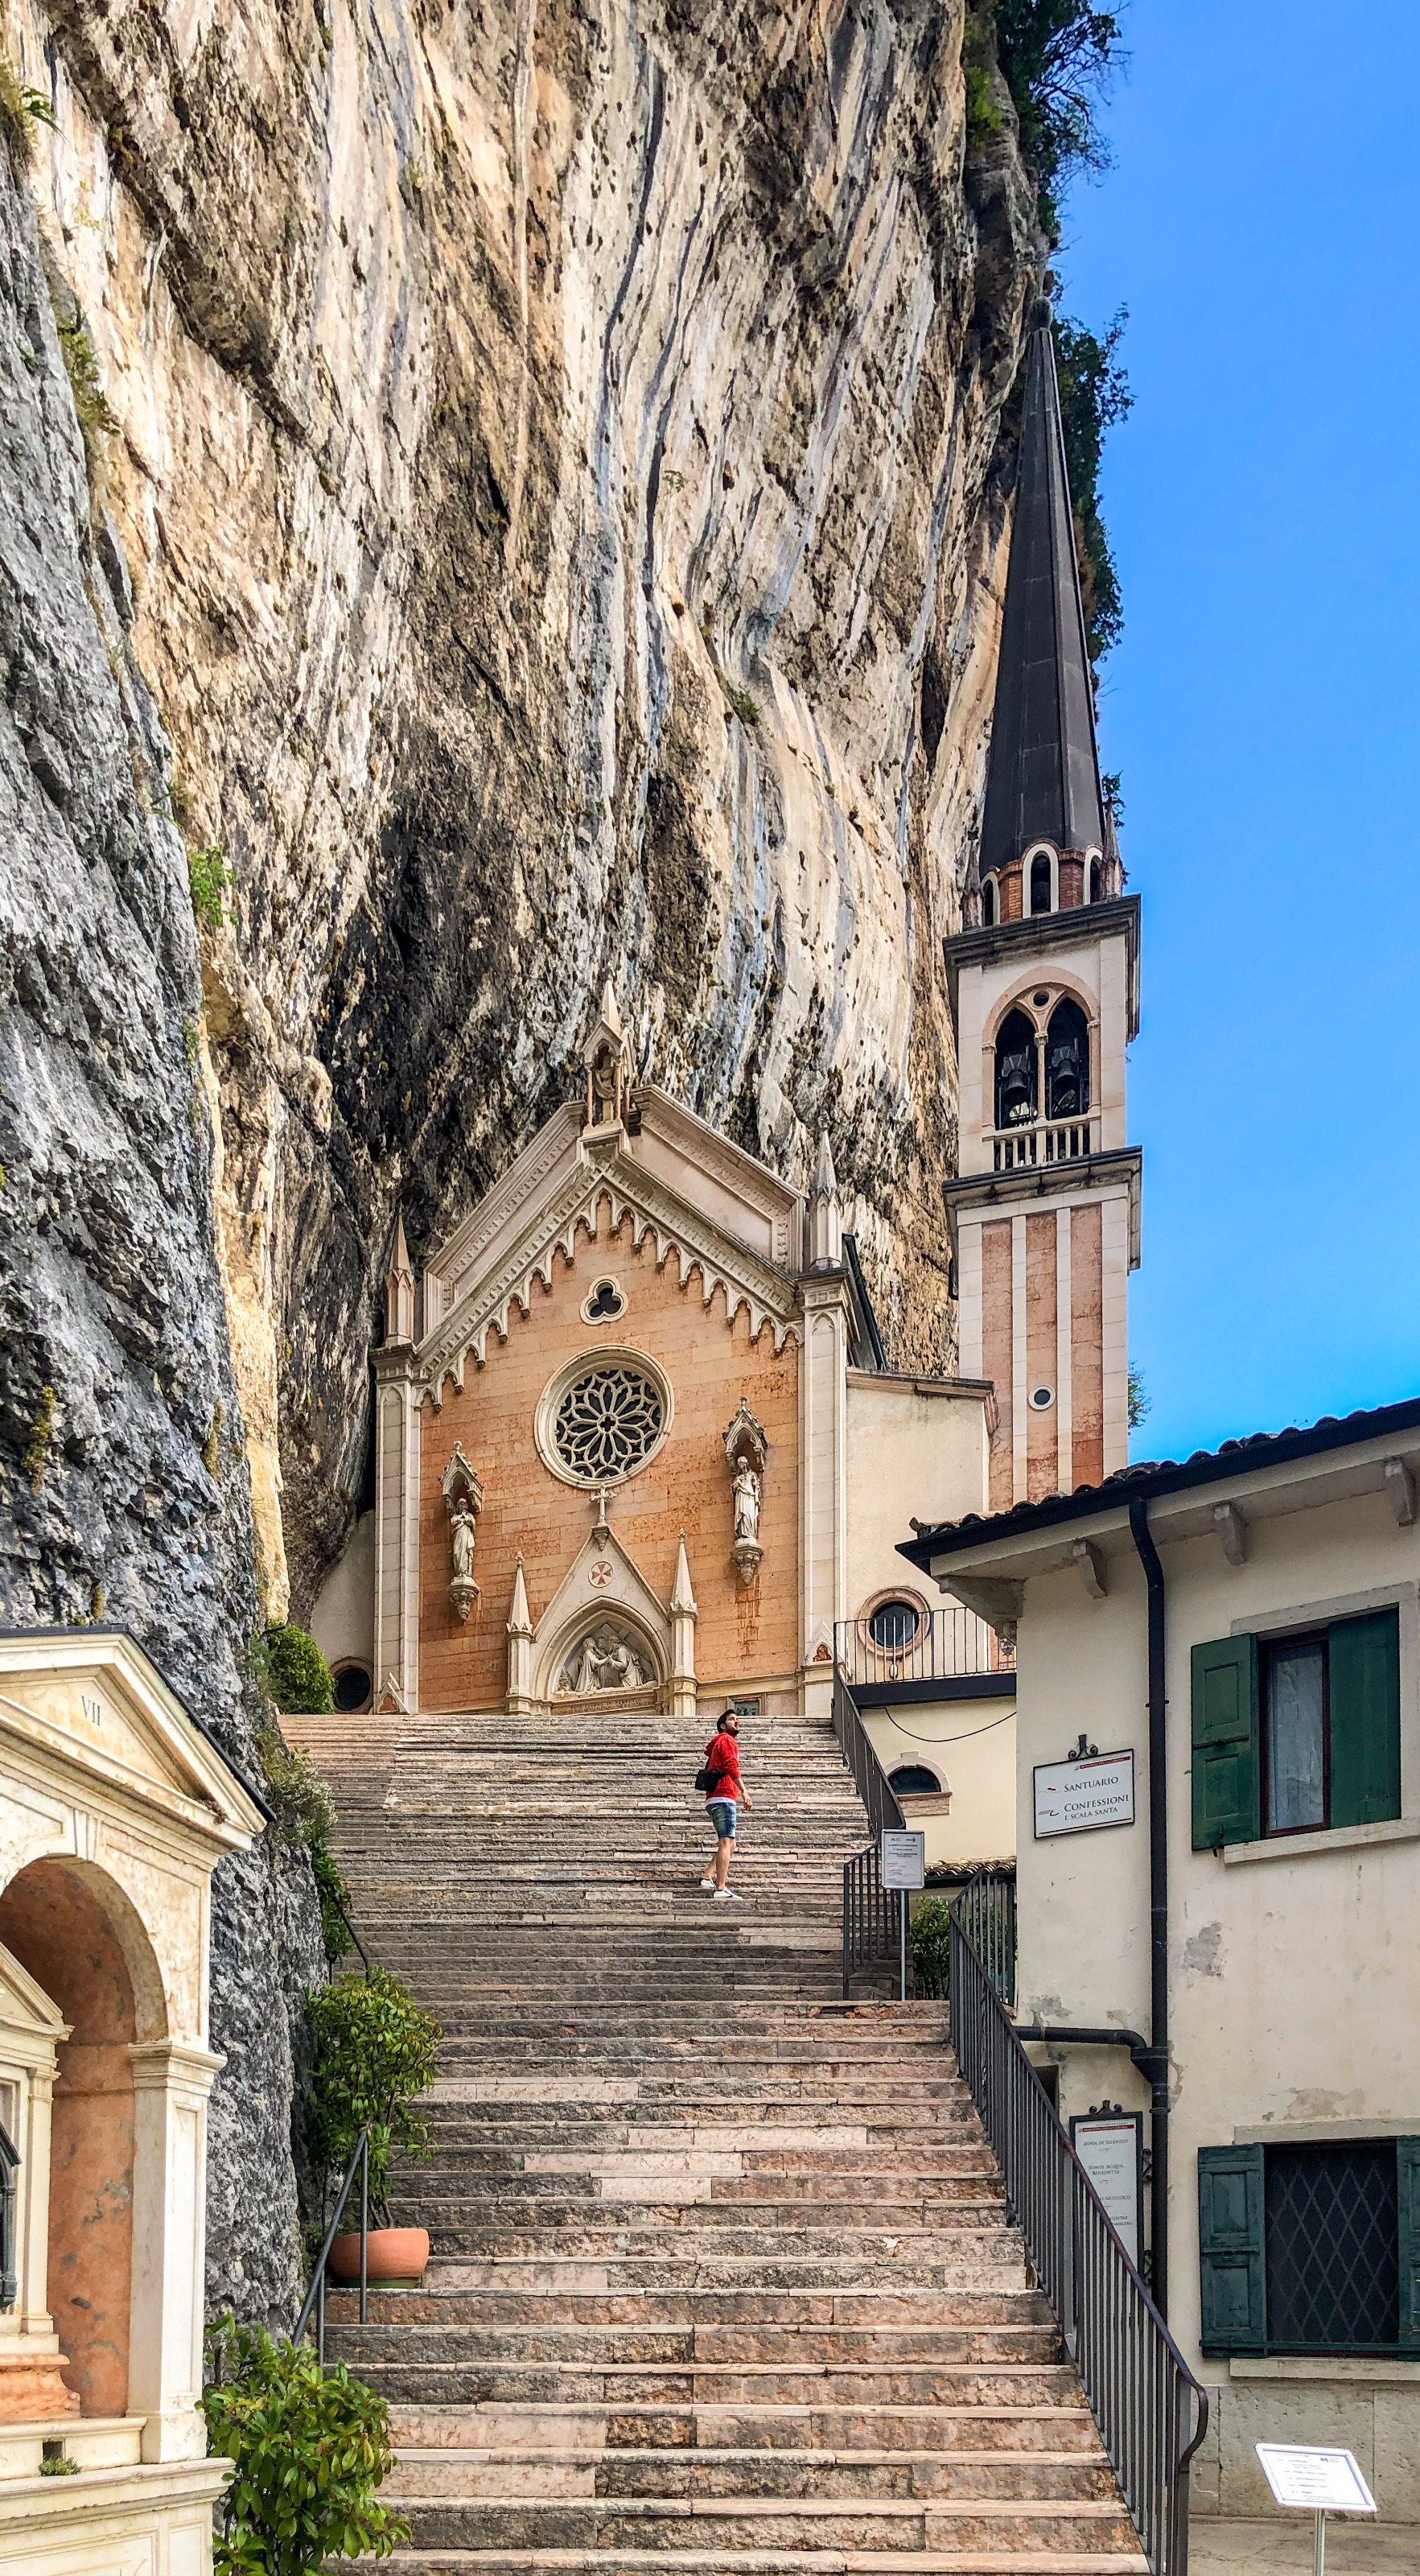 Italia - Italy - Casale Management - Travel - Veneto - Ferrara di Monte Baldo - Verona - Lago di Garda - Santuario Madonna della Corona - Scalinata Santuario